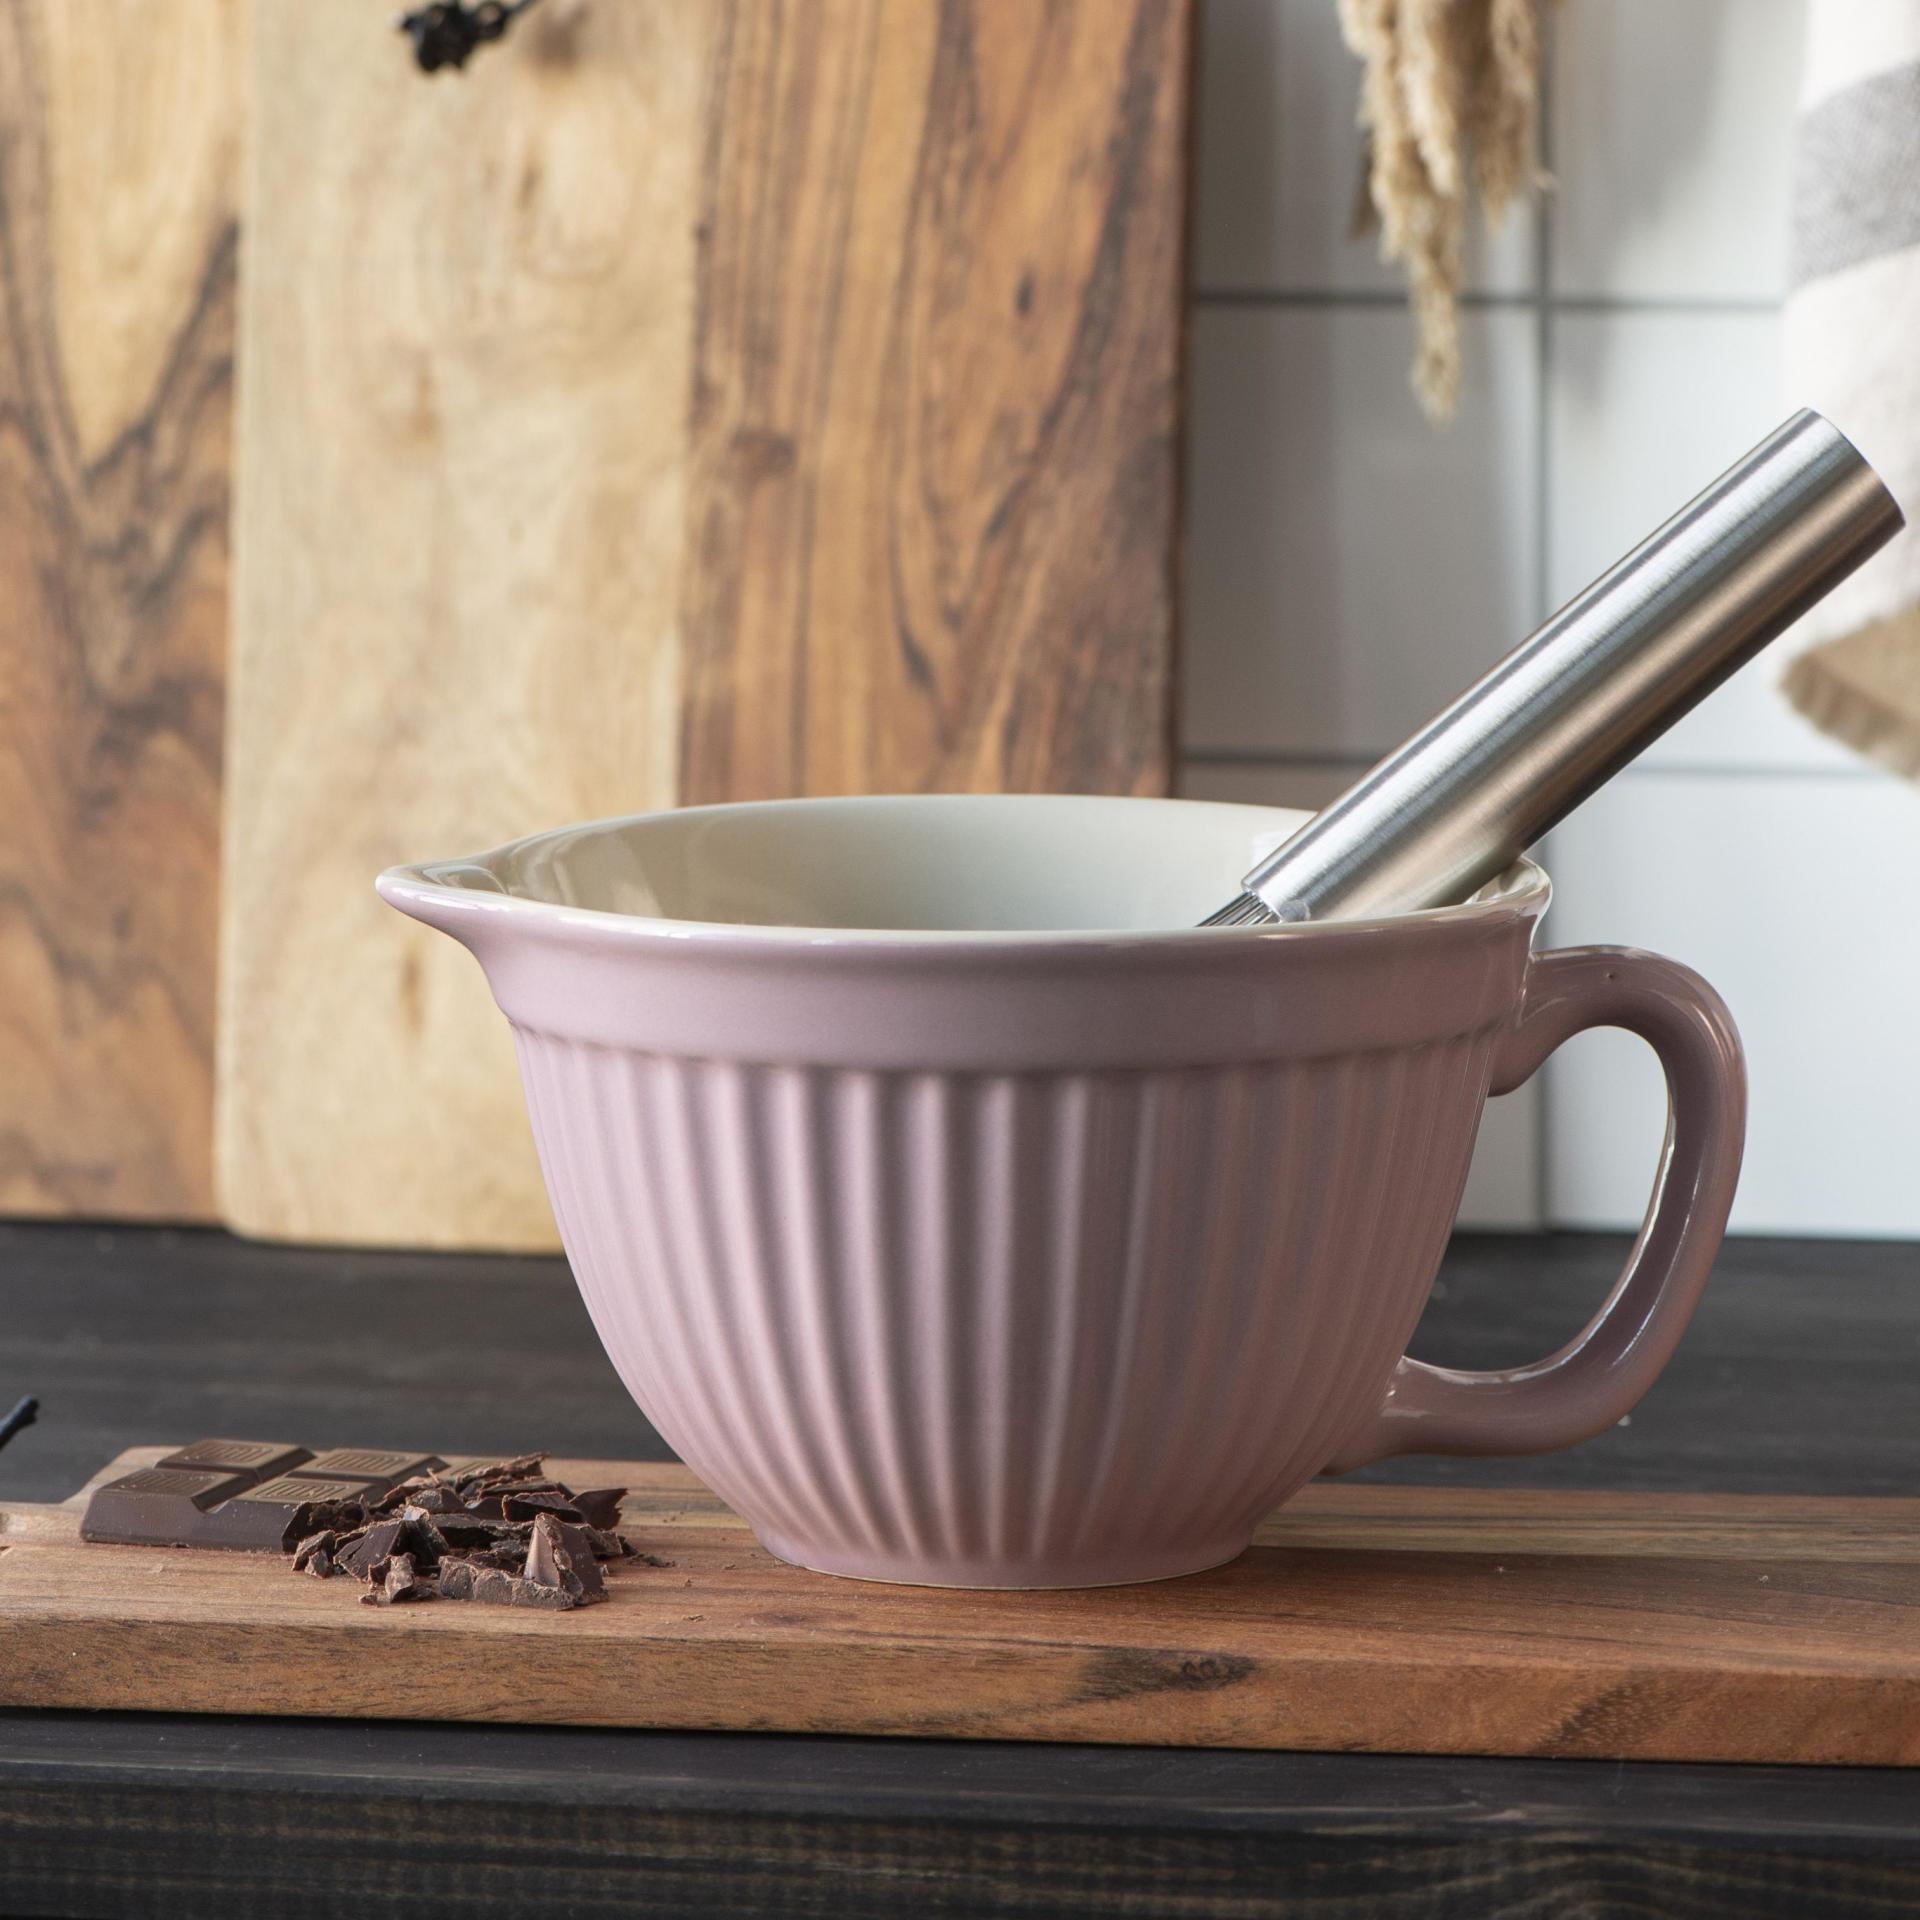 IB LAURSEN Mísa na těsto Mynte Lavender, růžová barva, fialová barva, keramika